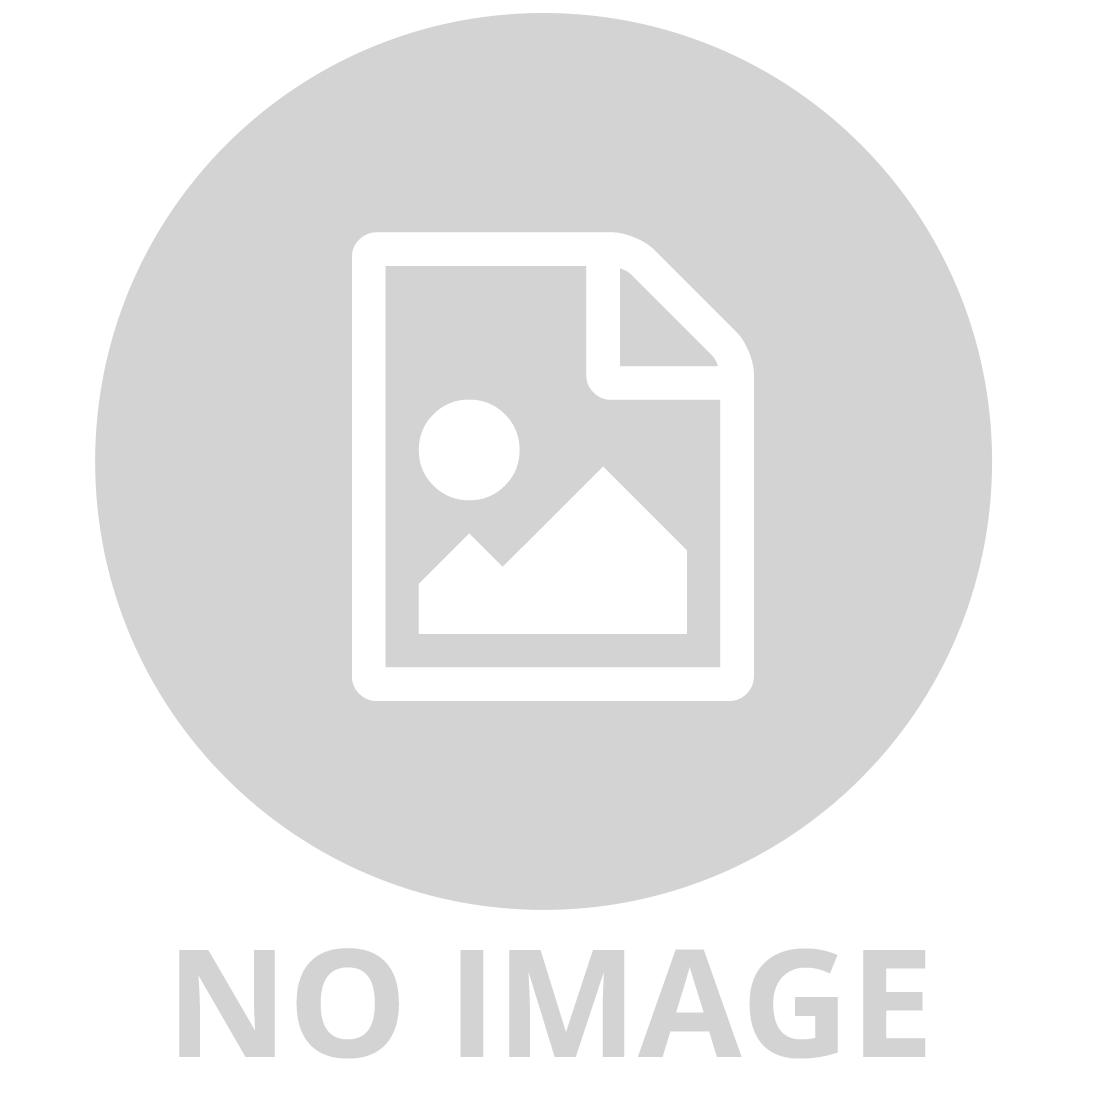 LEGO MARVEL SUPER HEROES 76100 ROYAL TALON FIGHTER ATTACK